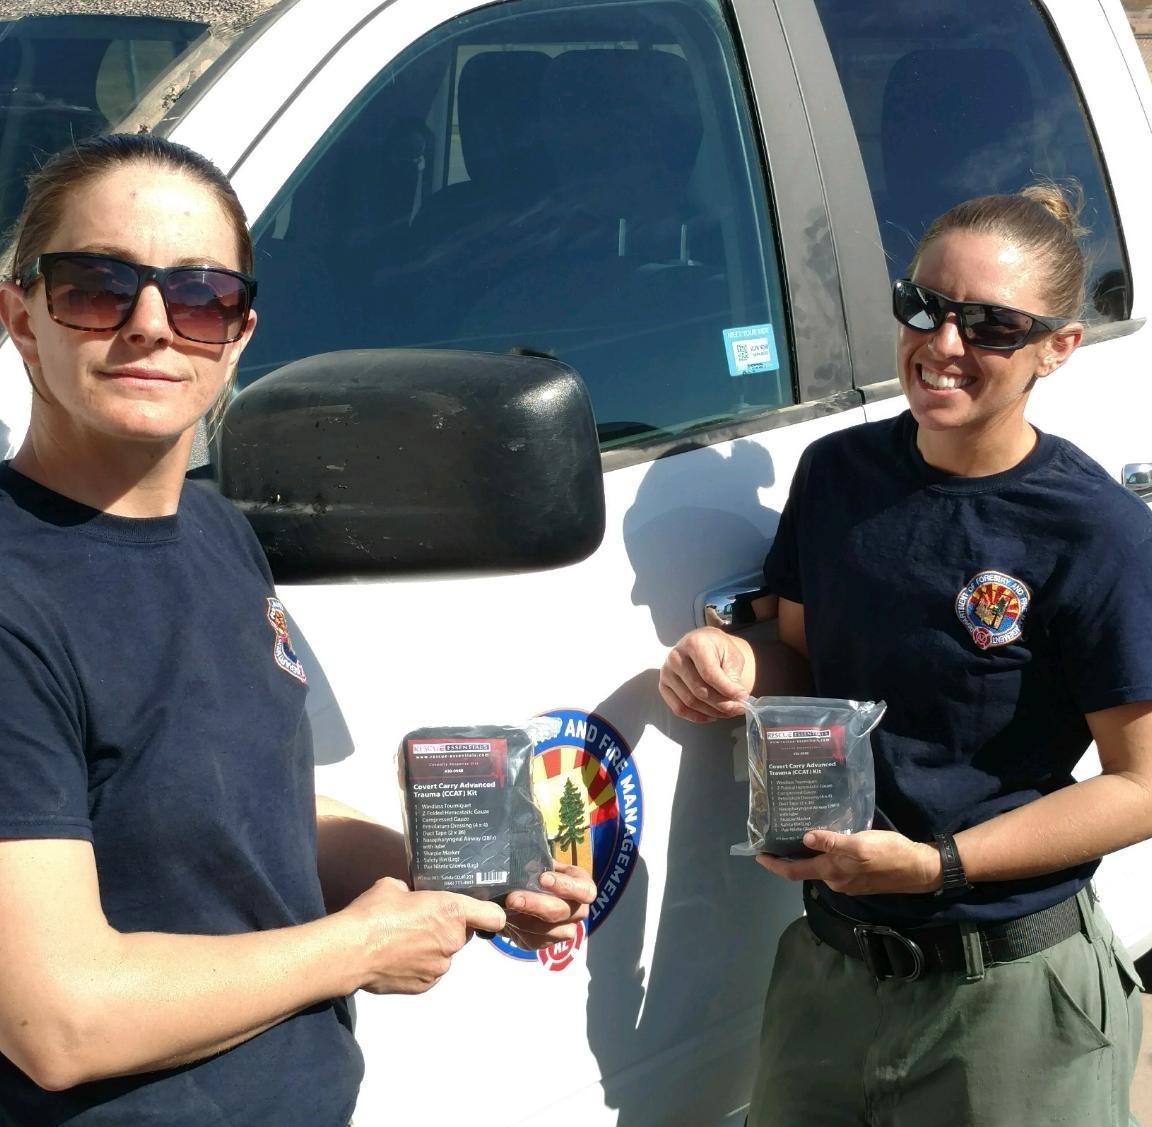 Phoenix Crew with Advanced Trauma Kits